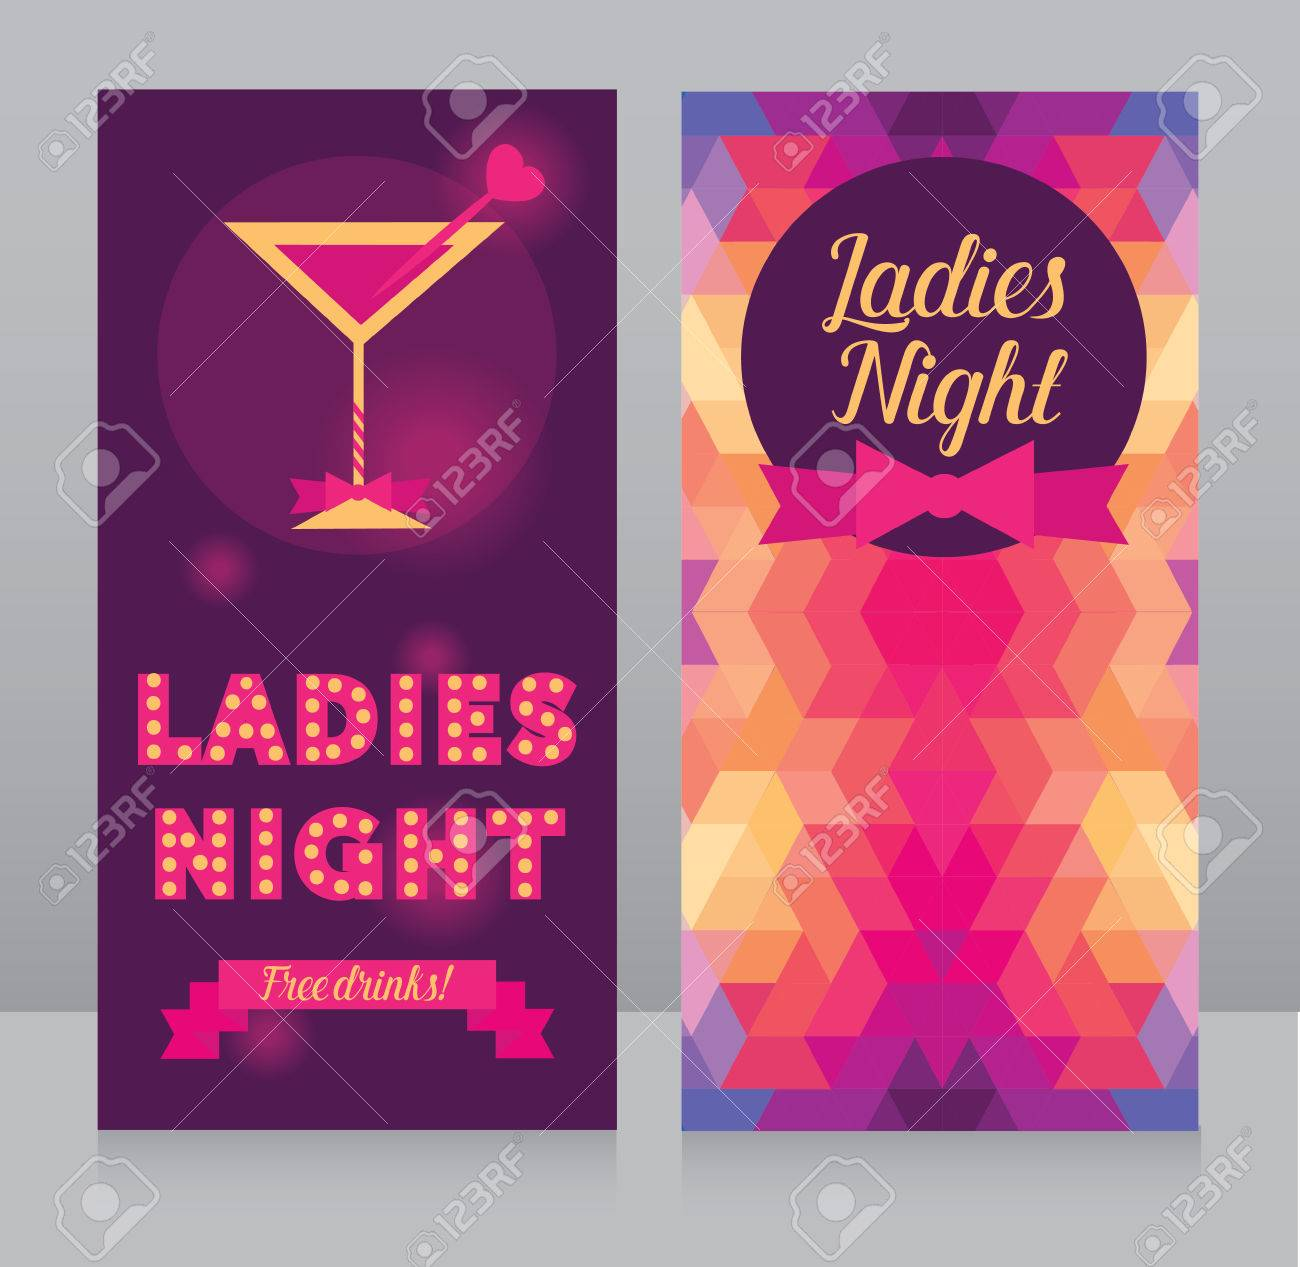 Free Bachelorette Party Invitation Templates – Bachelorette Party Invites Templates